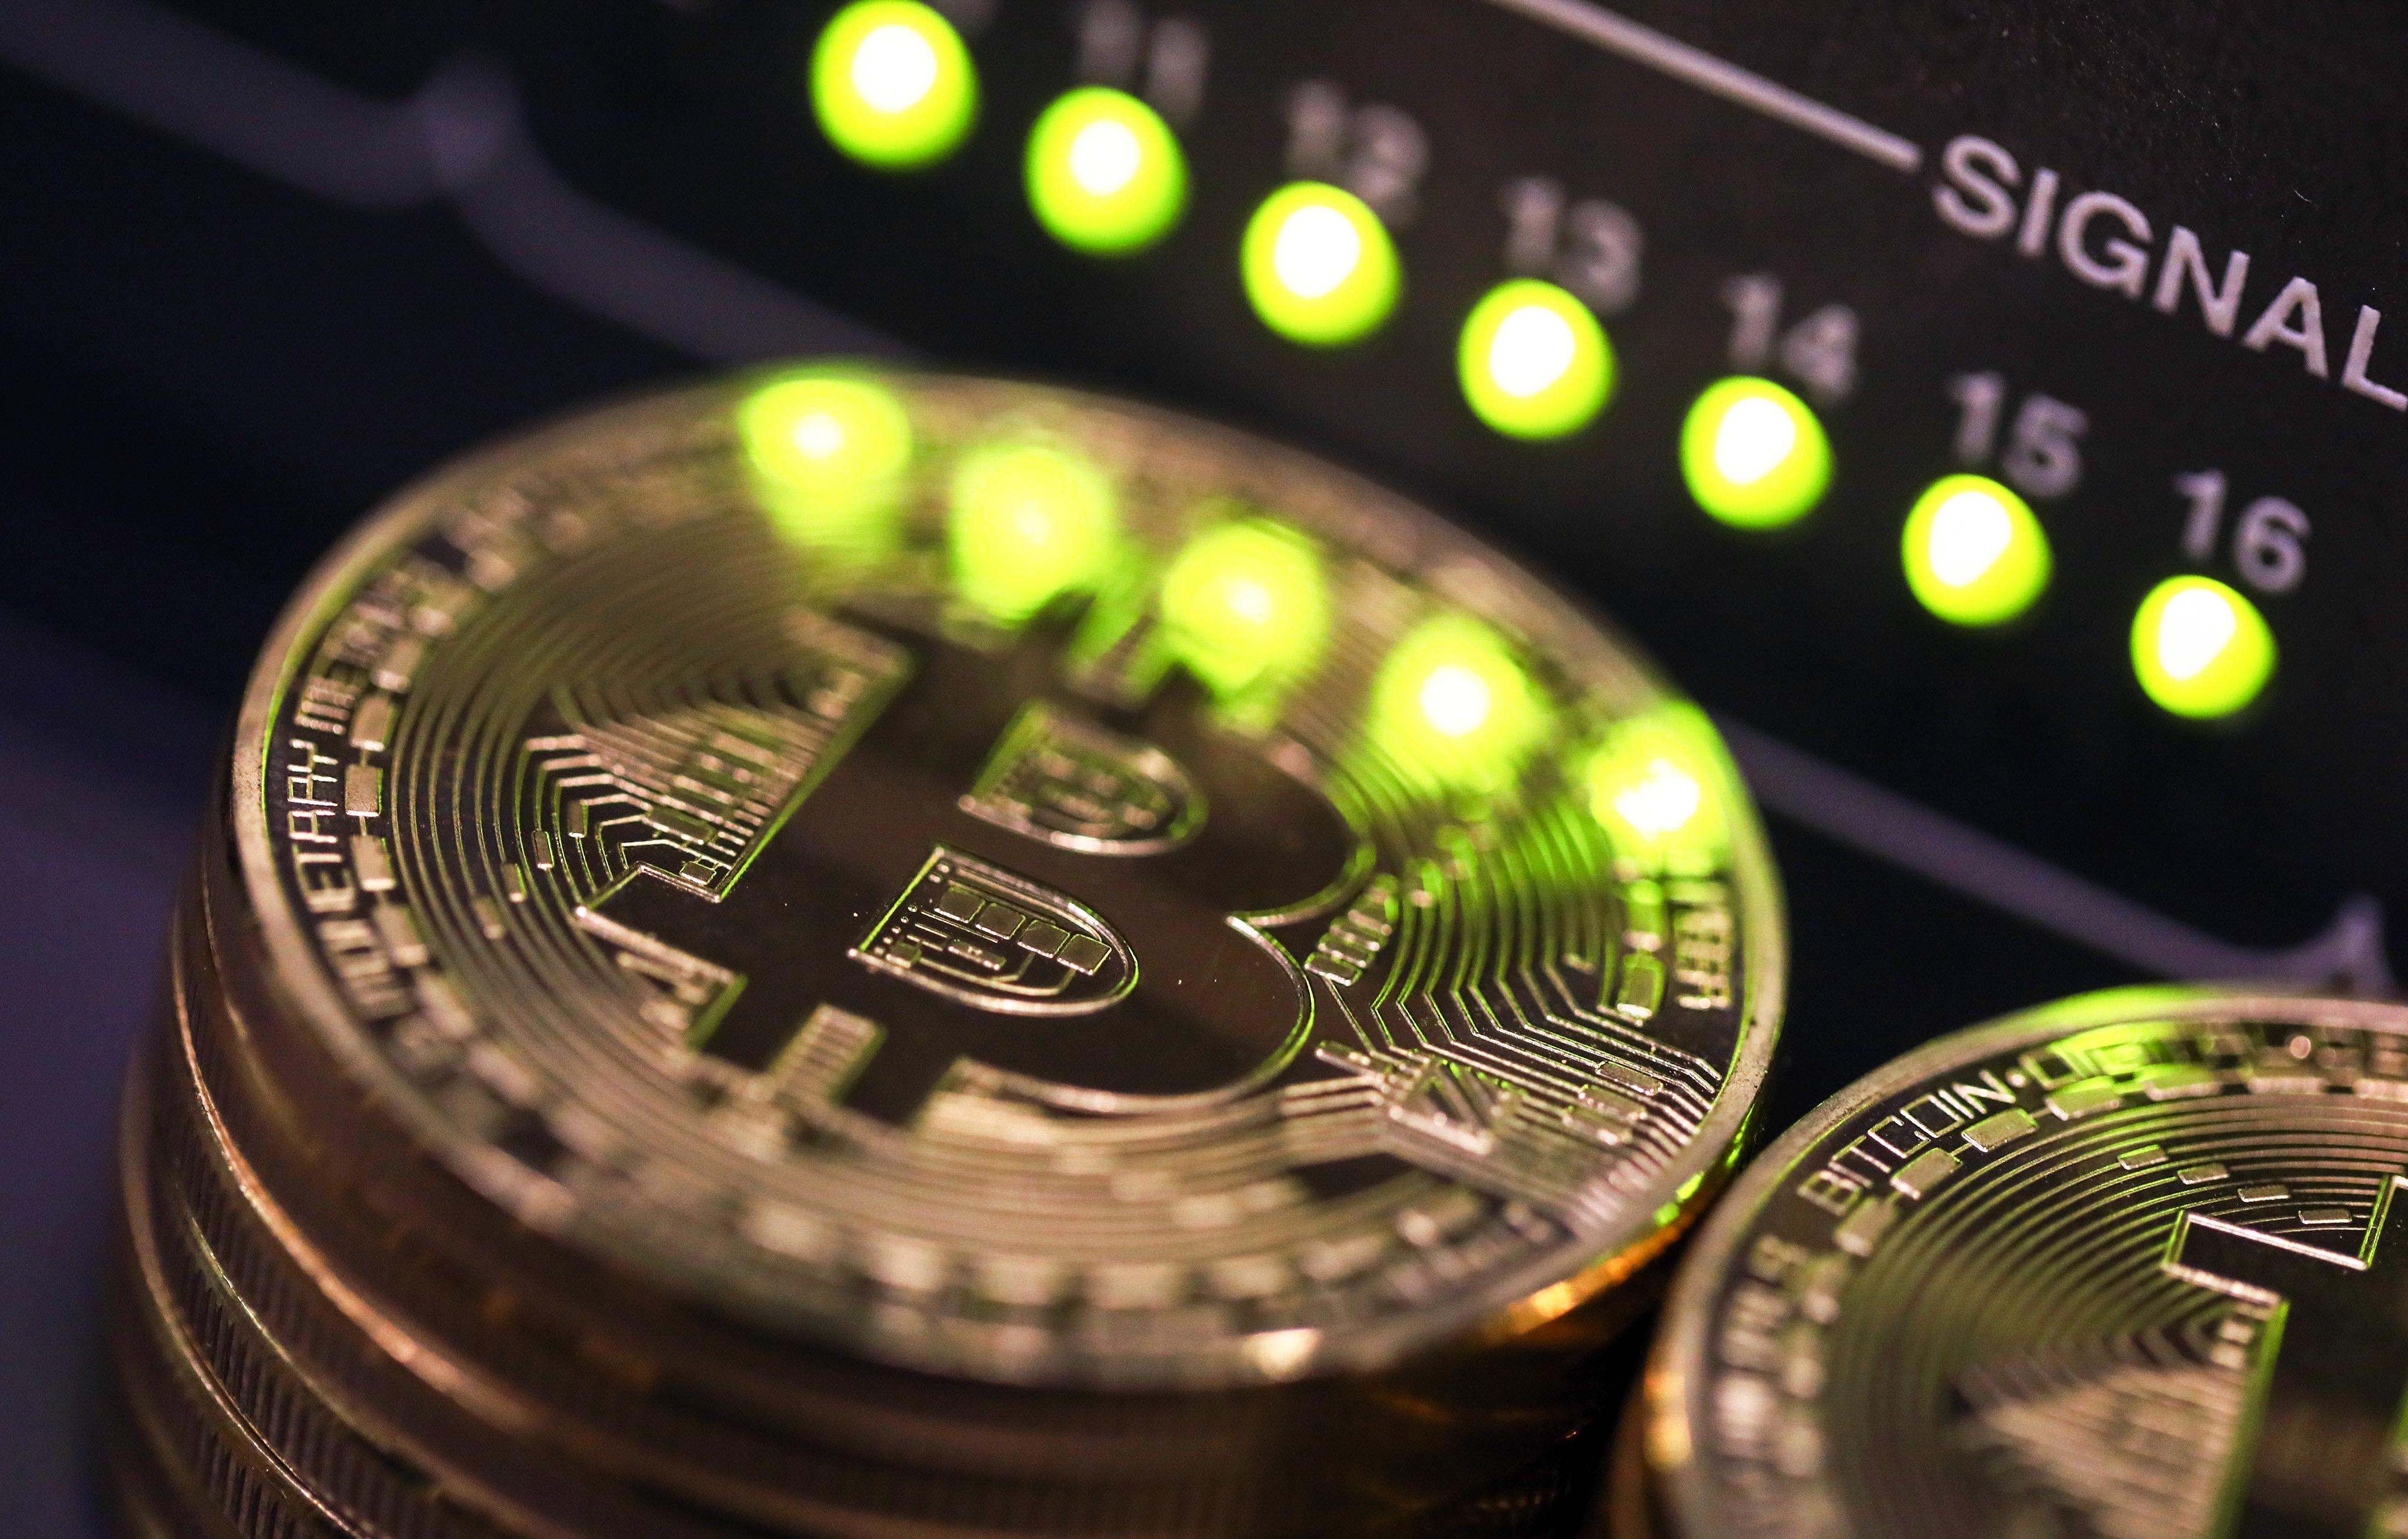 Bitcoins hackable routers joelmir betting biografia de rodner